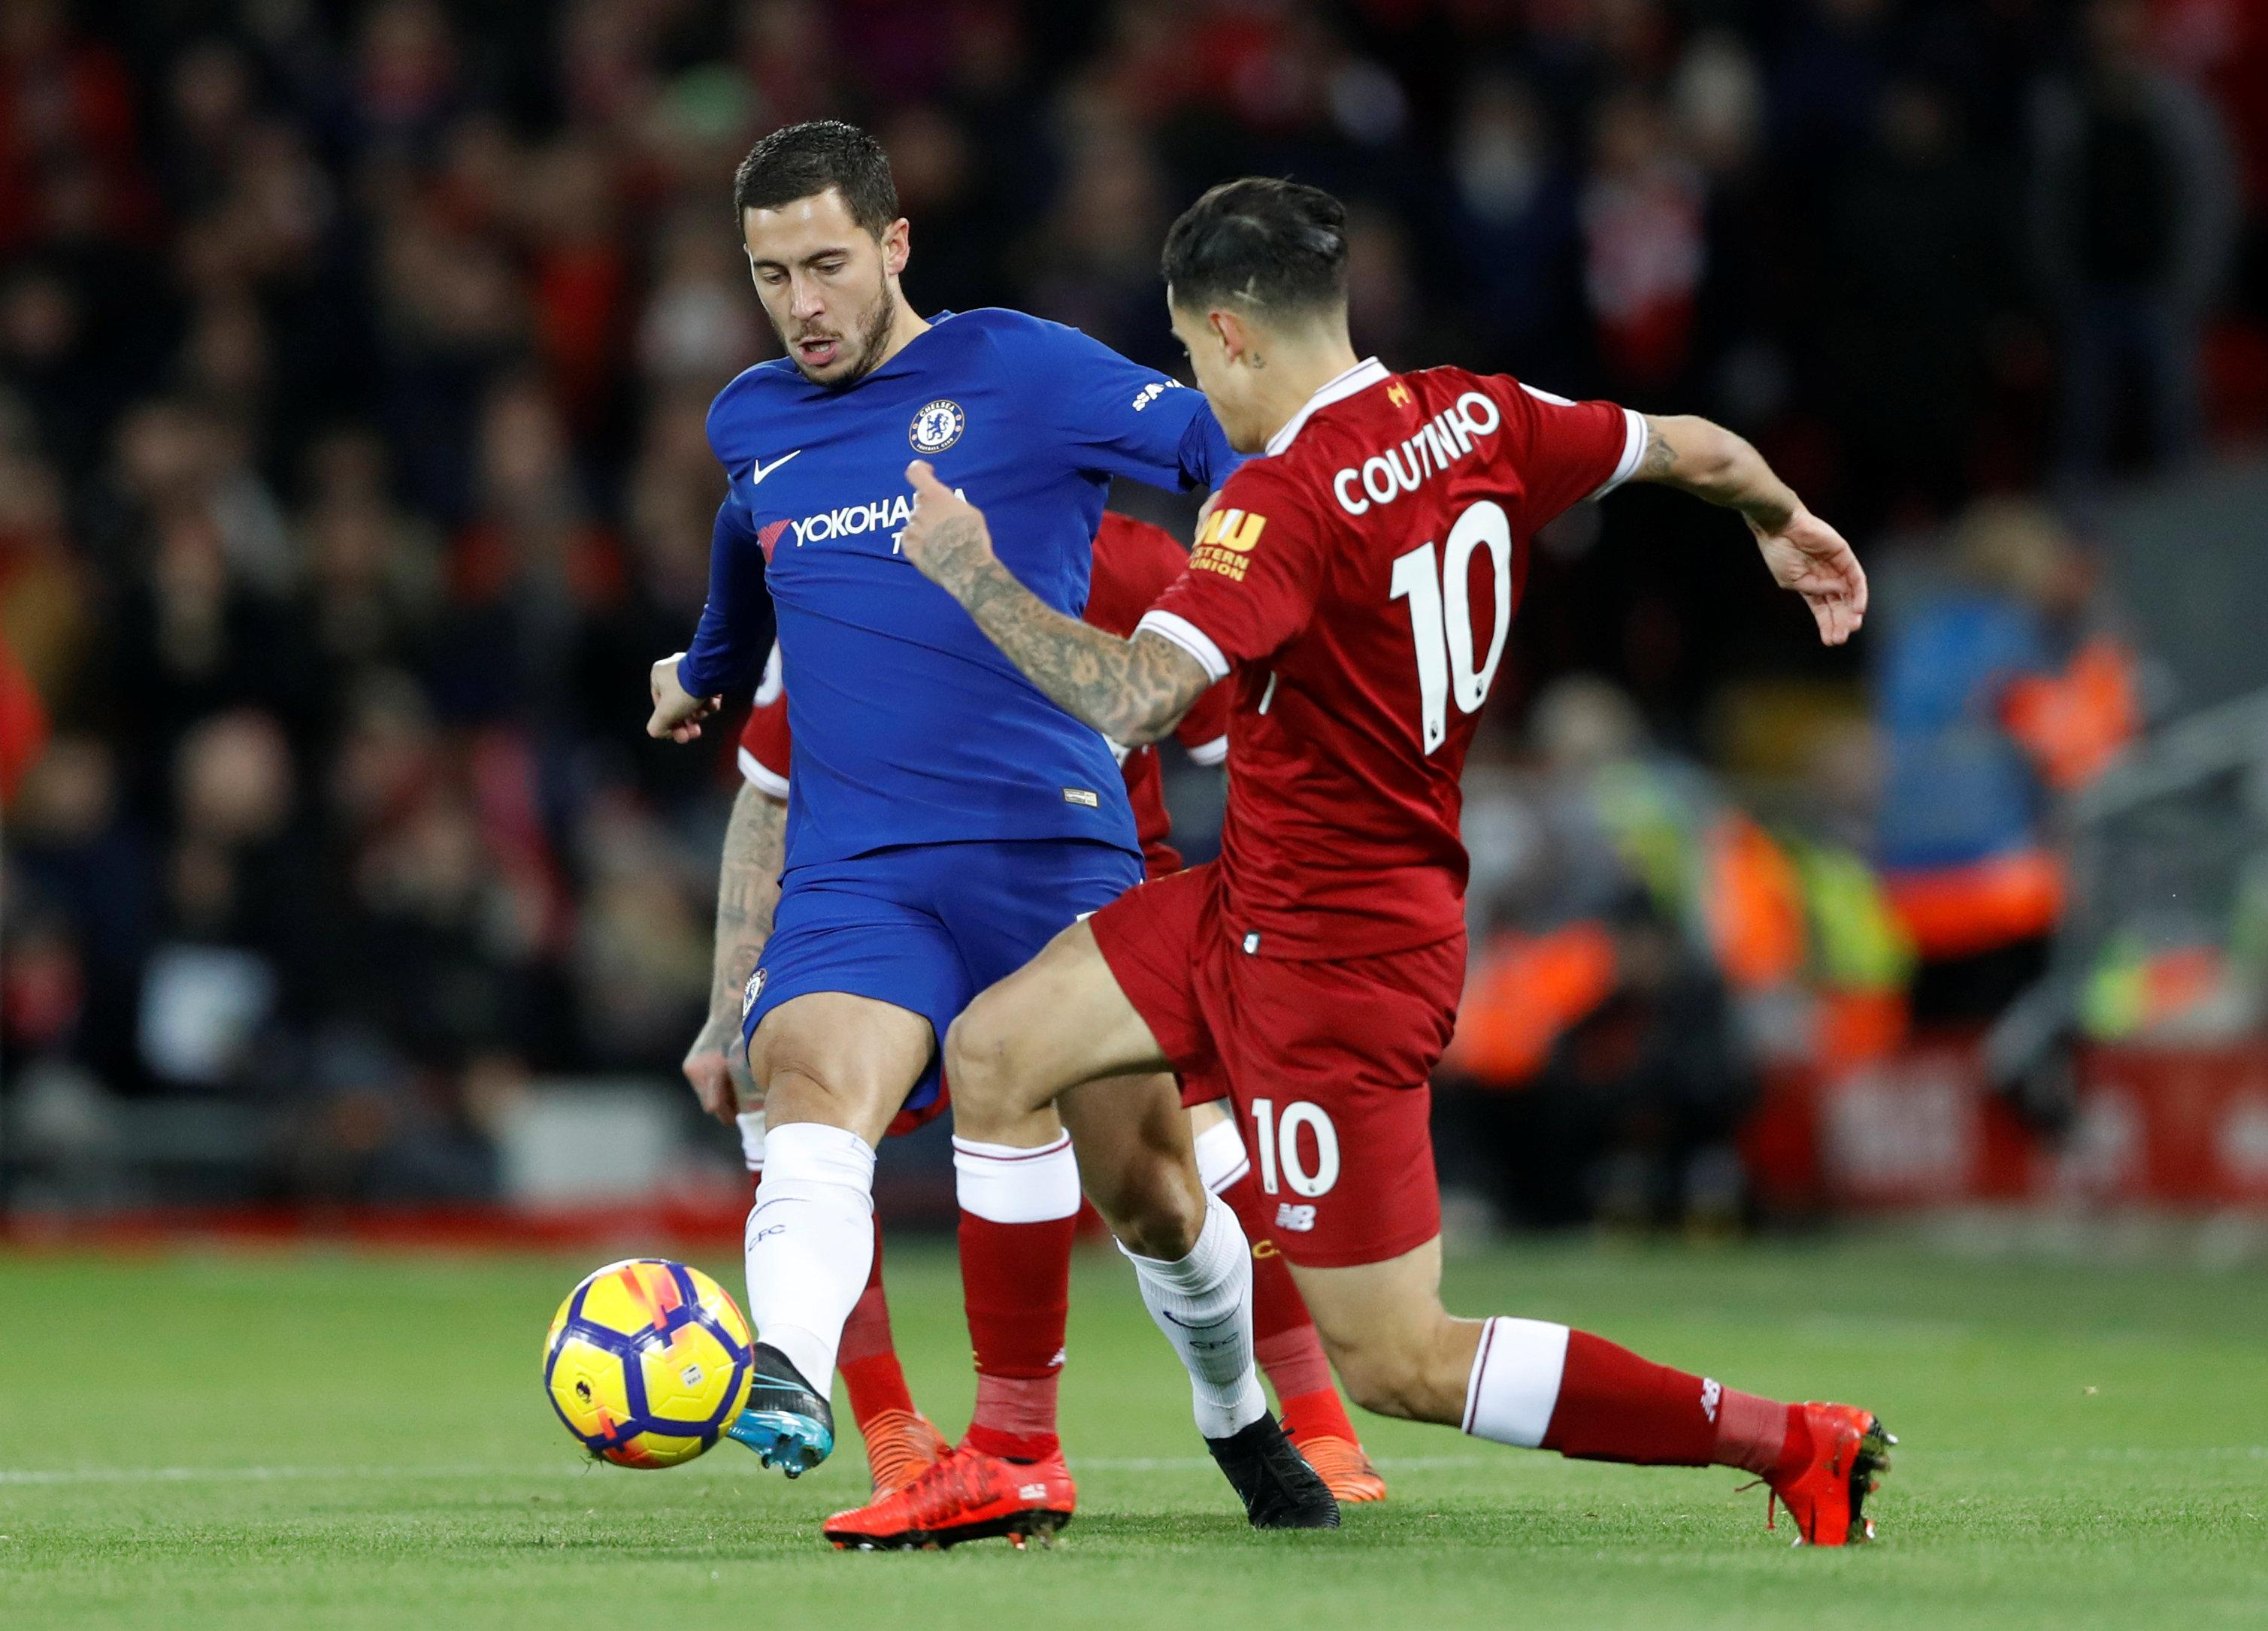 Hazard outshone Coutinho on Saturday